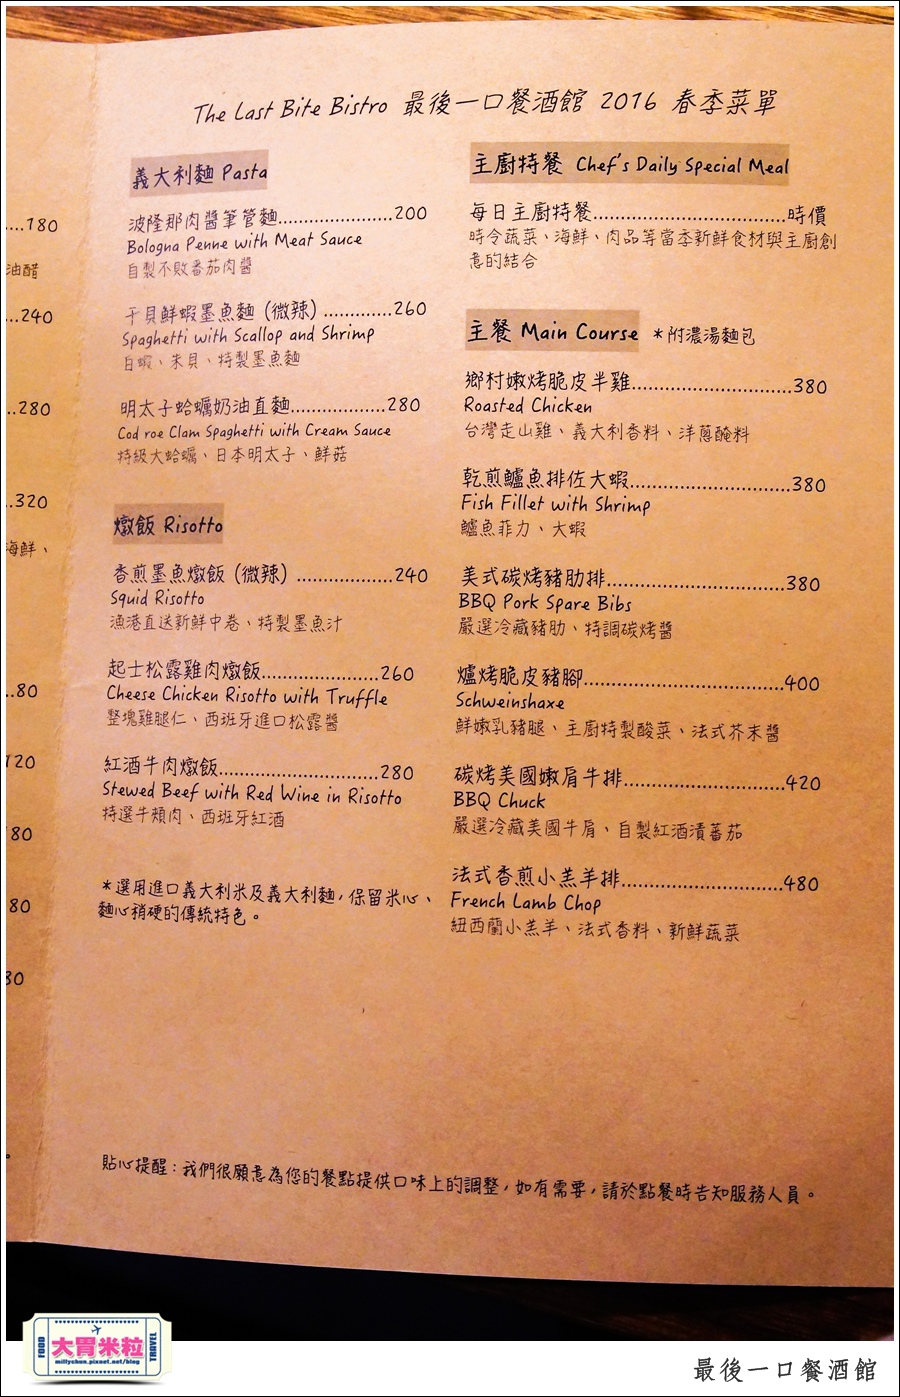 The Last Bite Bistro 最後一口餐酒館@高雄餐酒館推薦@大胃米粒0014.jpg